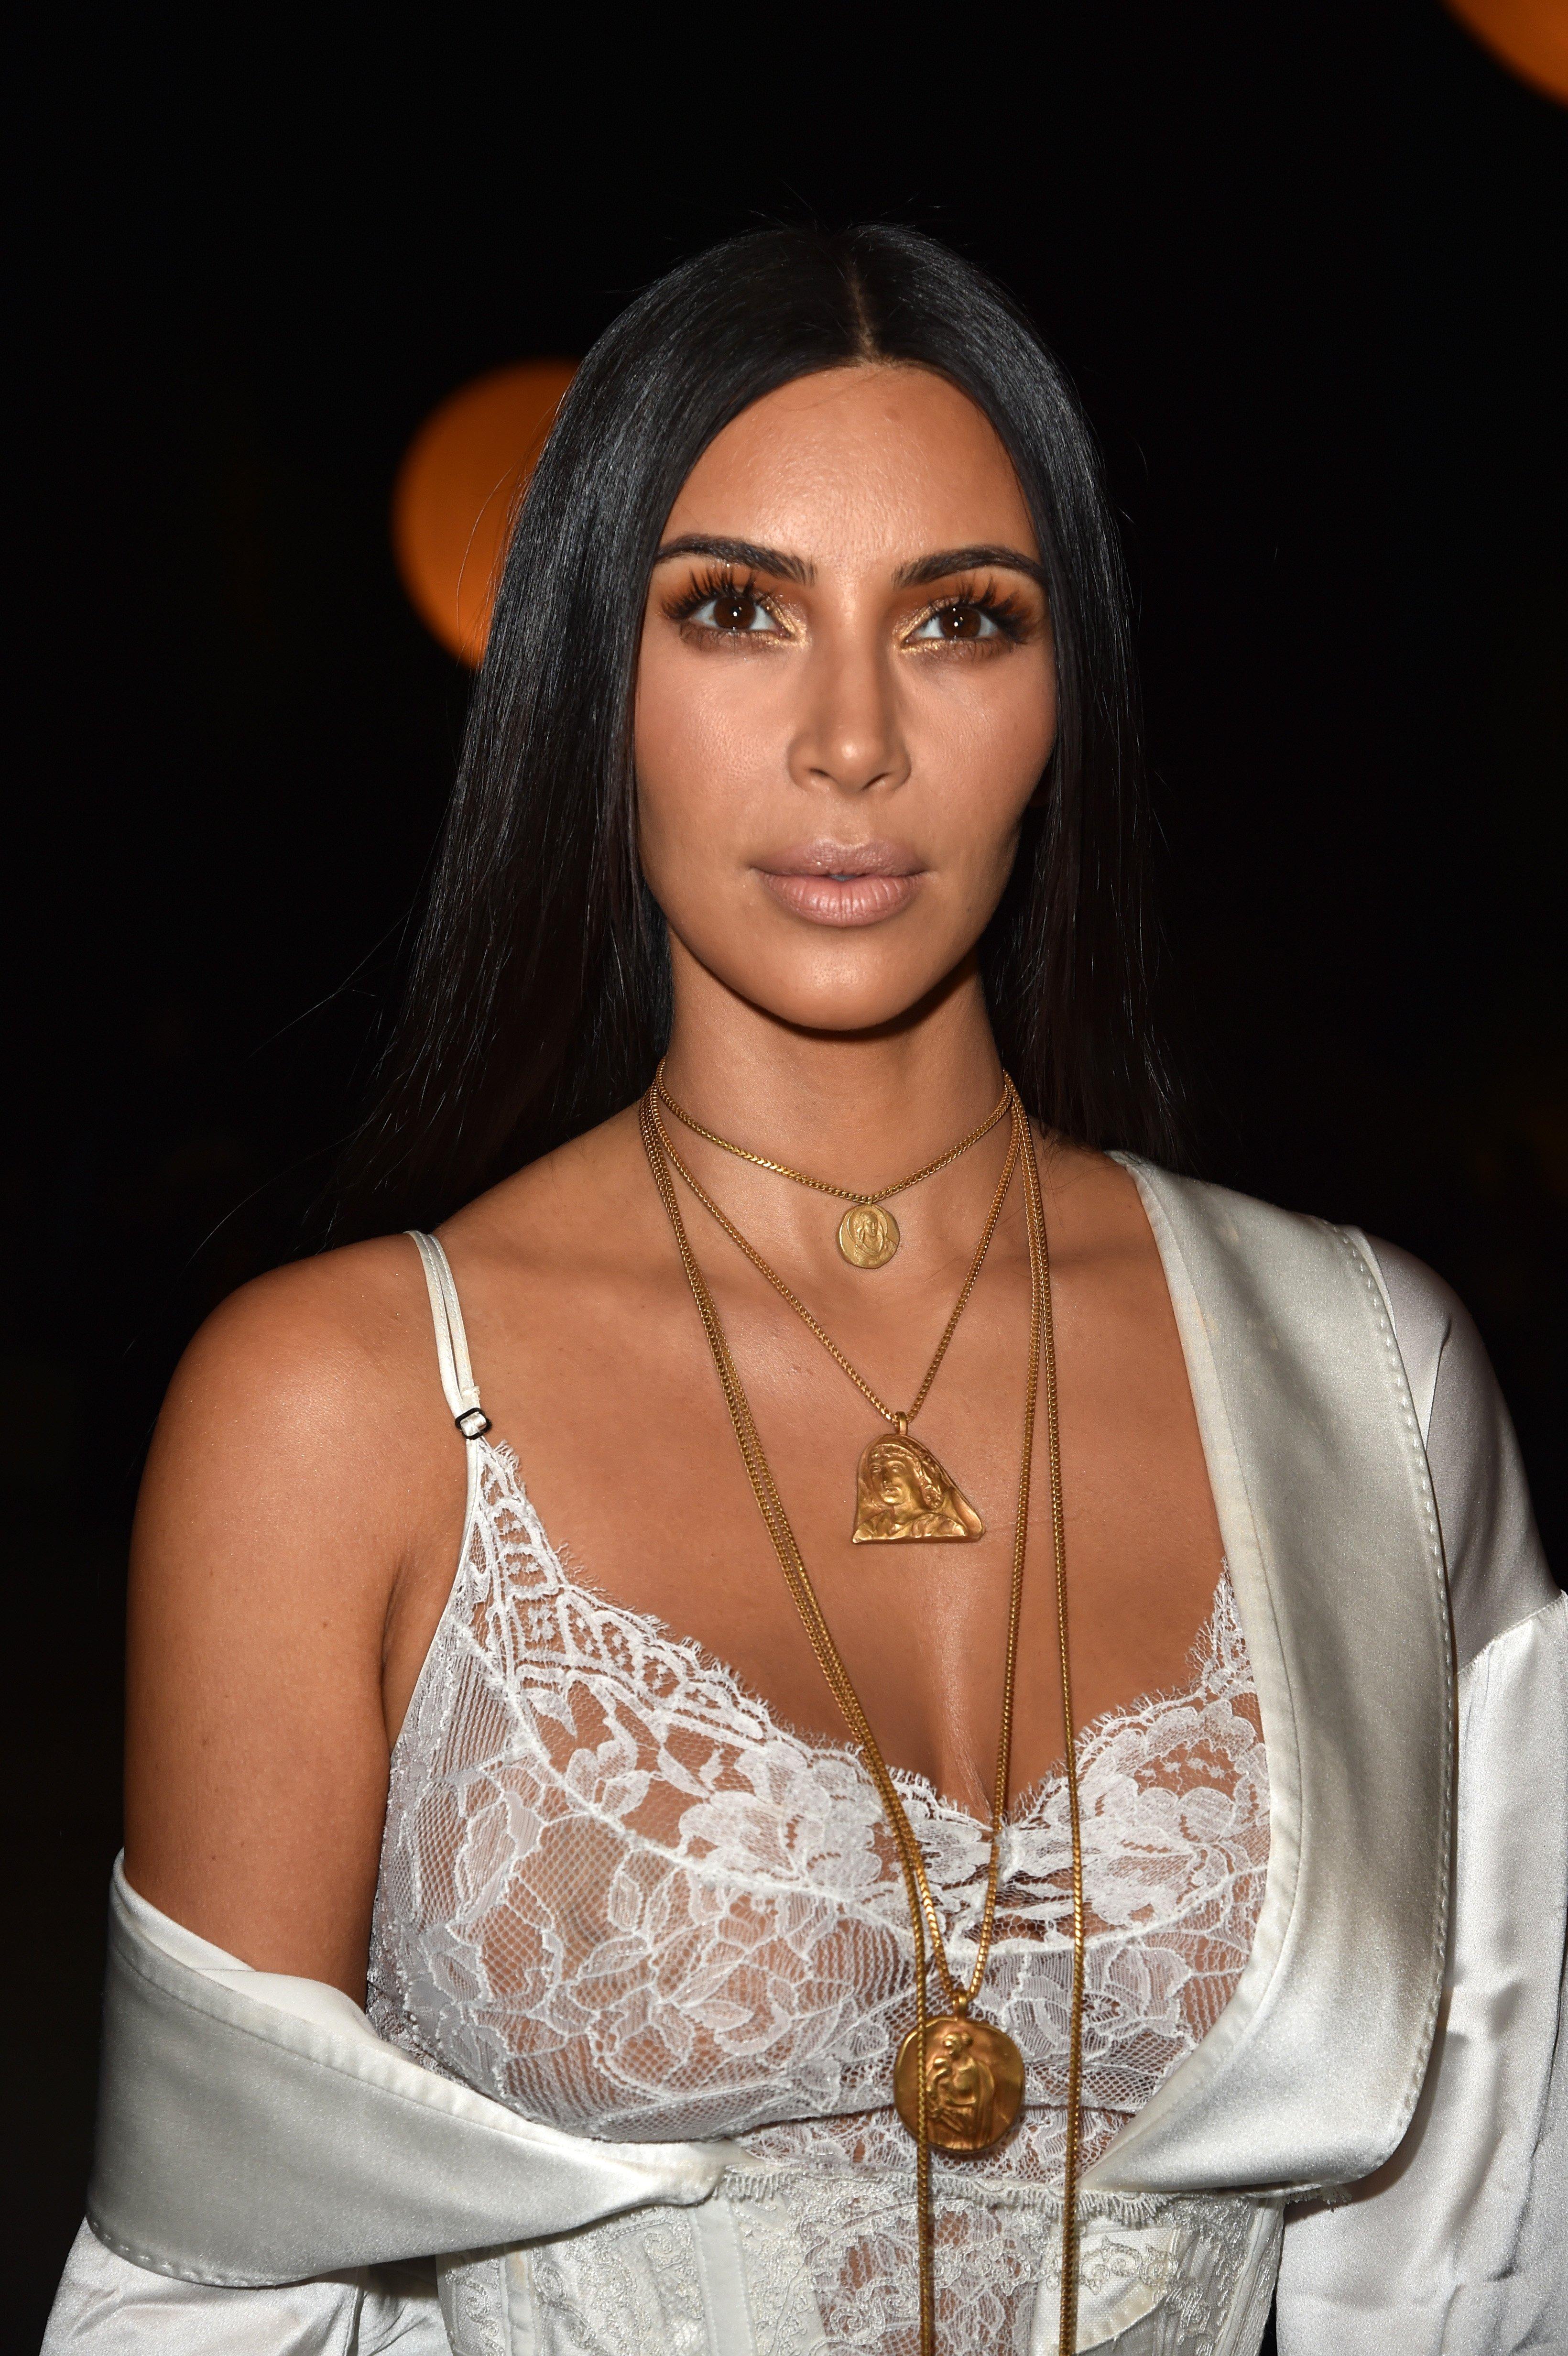 Kim Kardashian West Robbed Of Millions